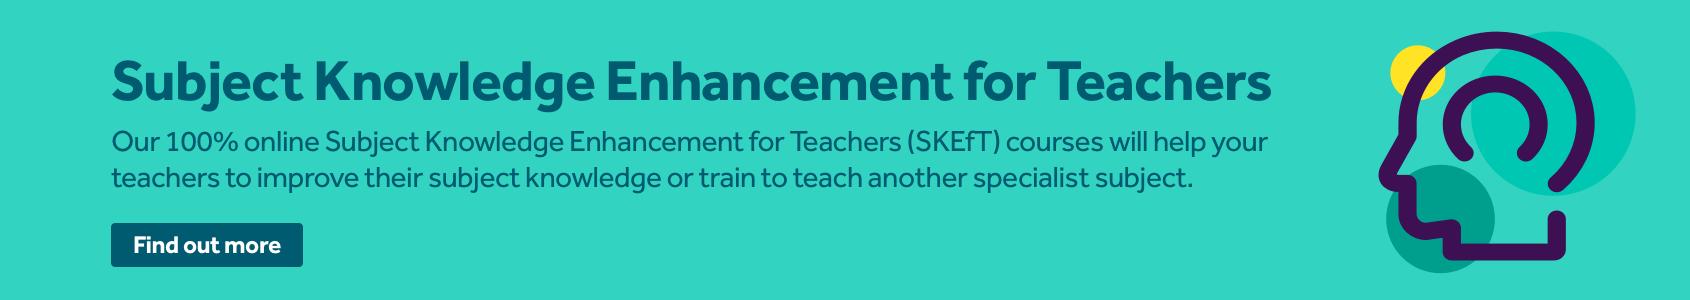 Tes Subject Knowledge Enhancement for teachers